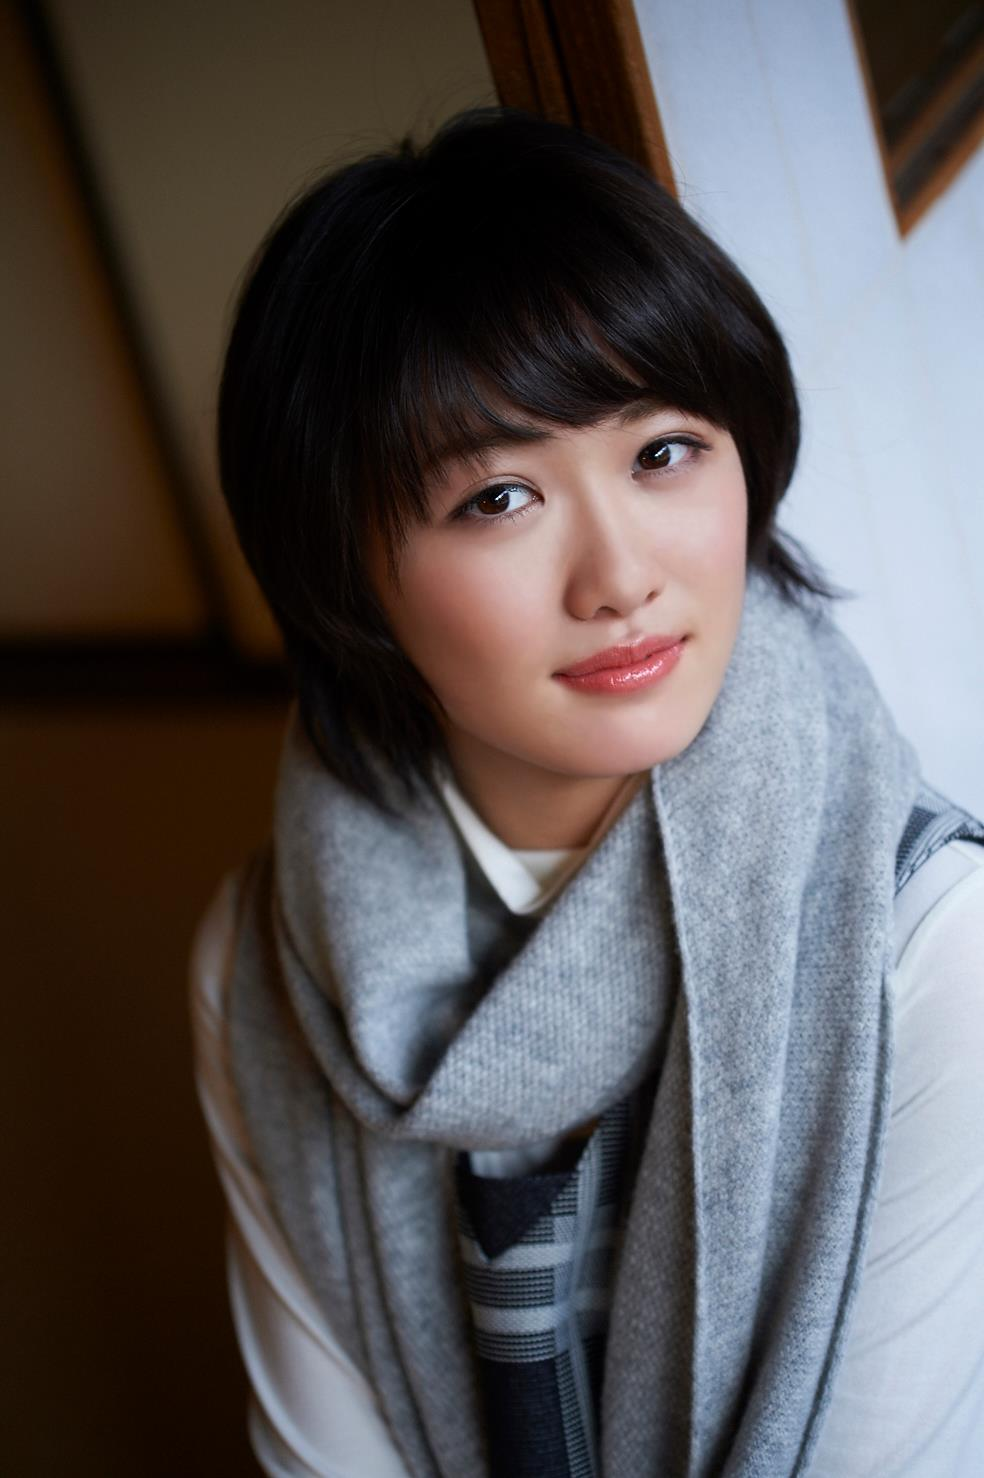 Kudo Haruka (工藤遥), Morning Musume (モーニング娘。)